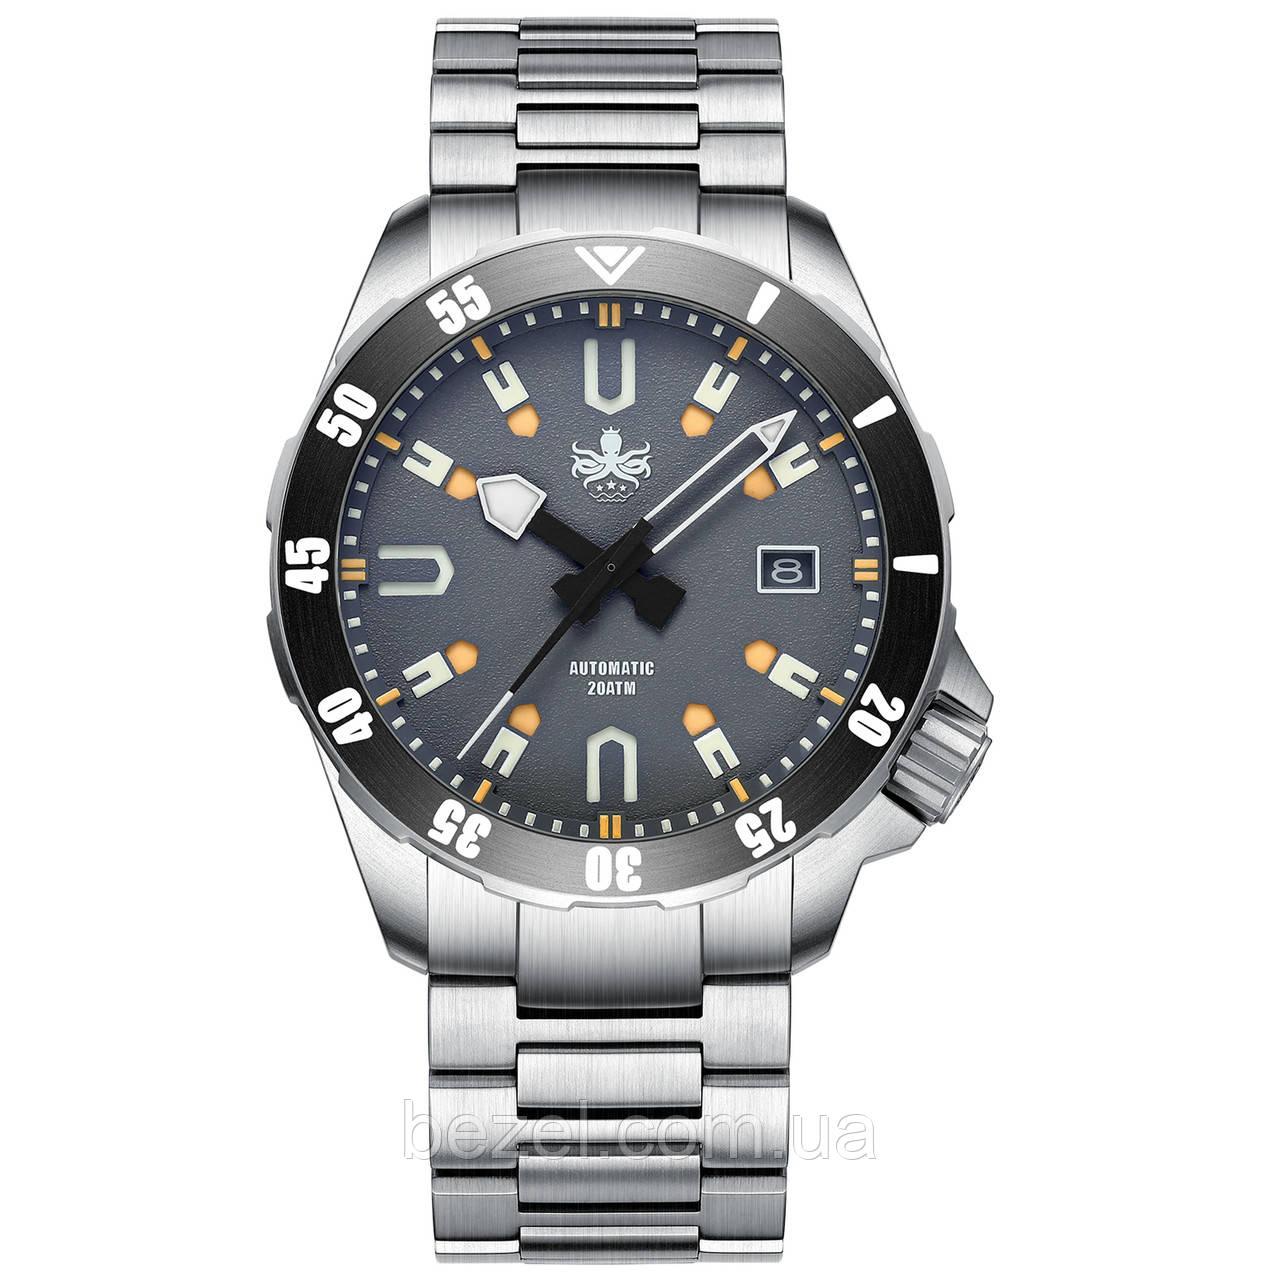 Чоловічі годинники PHOIBOS APOLLO TITANIUM PY031G 200M Automatic Diver Watch Gray